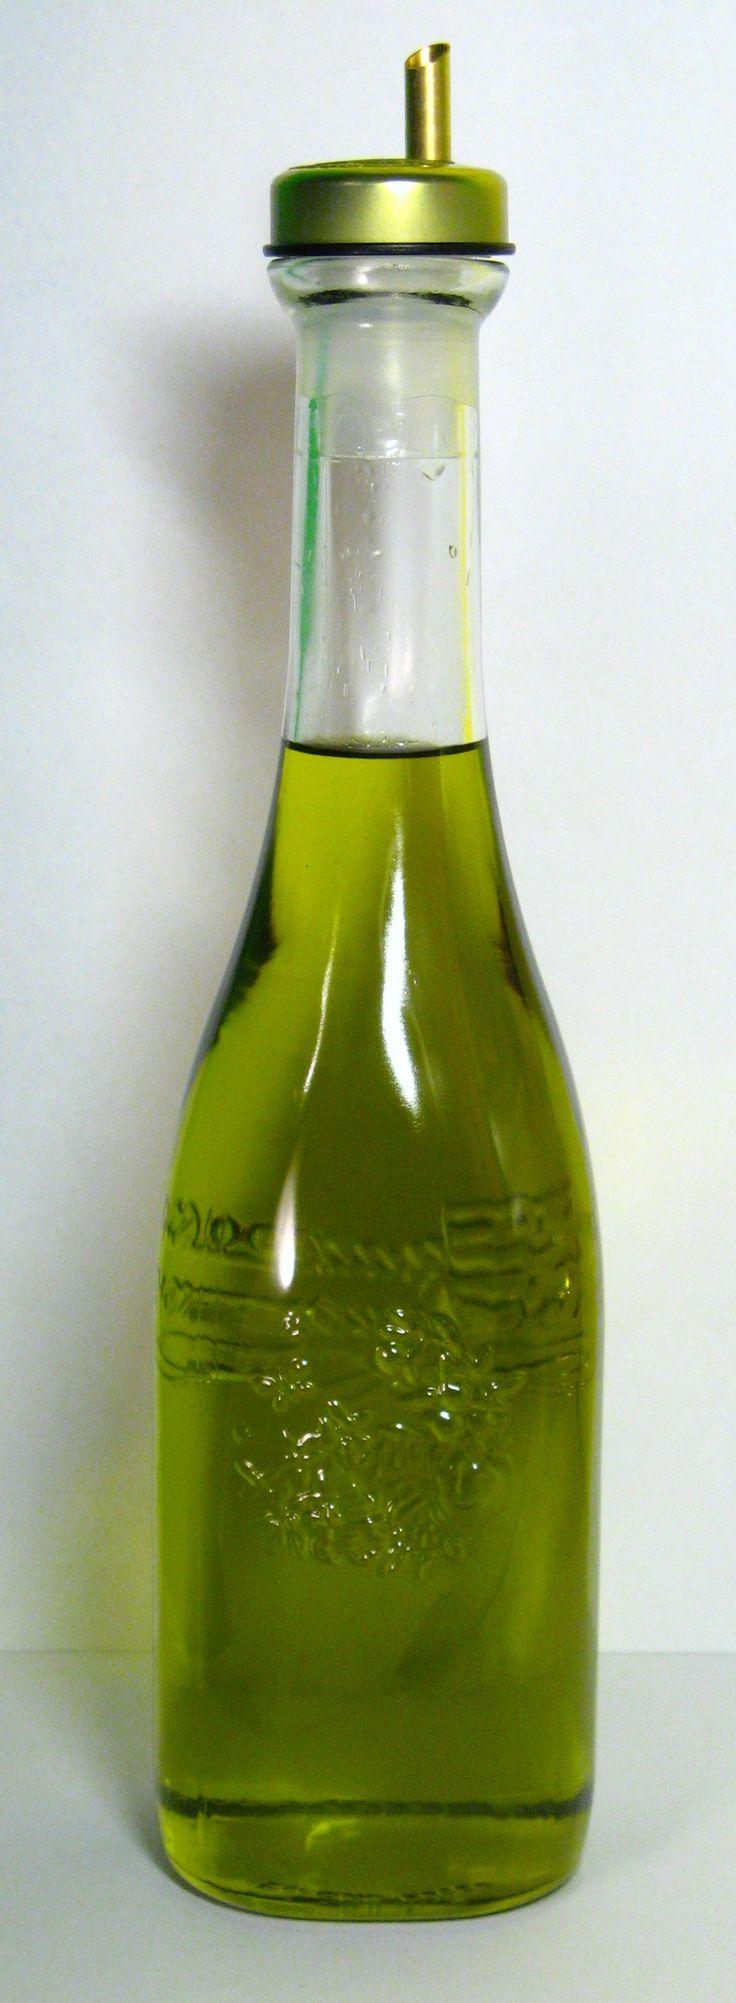 besten 25 olive oil on hair ideen auf pinterest trockene